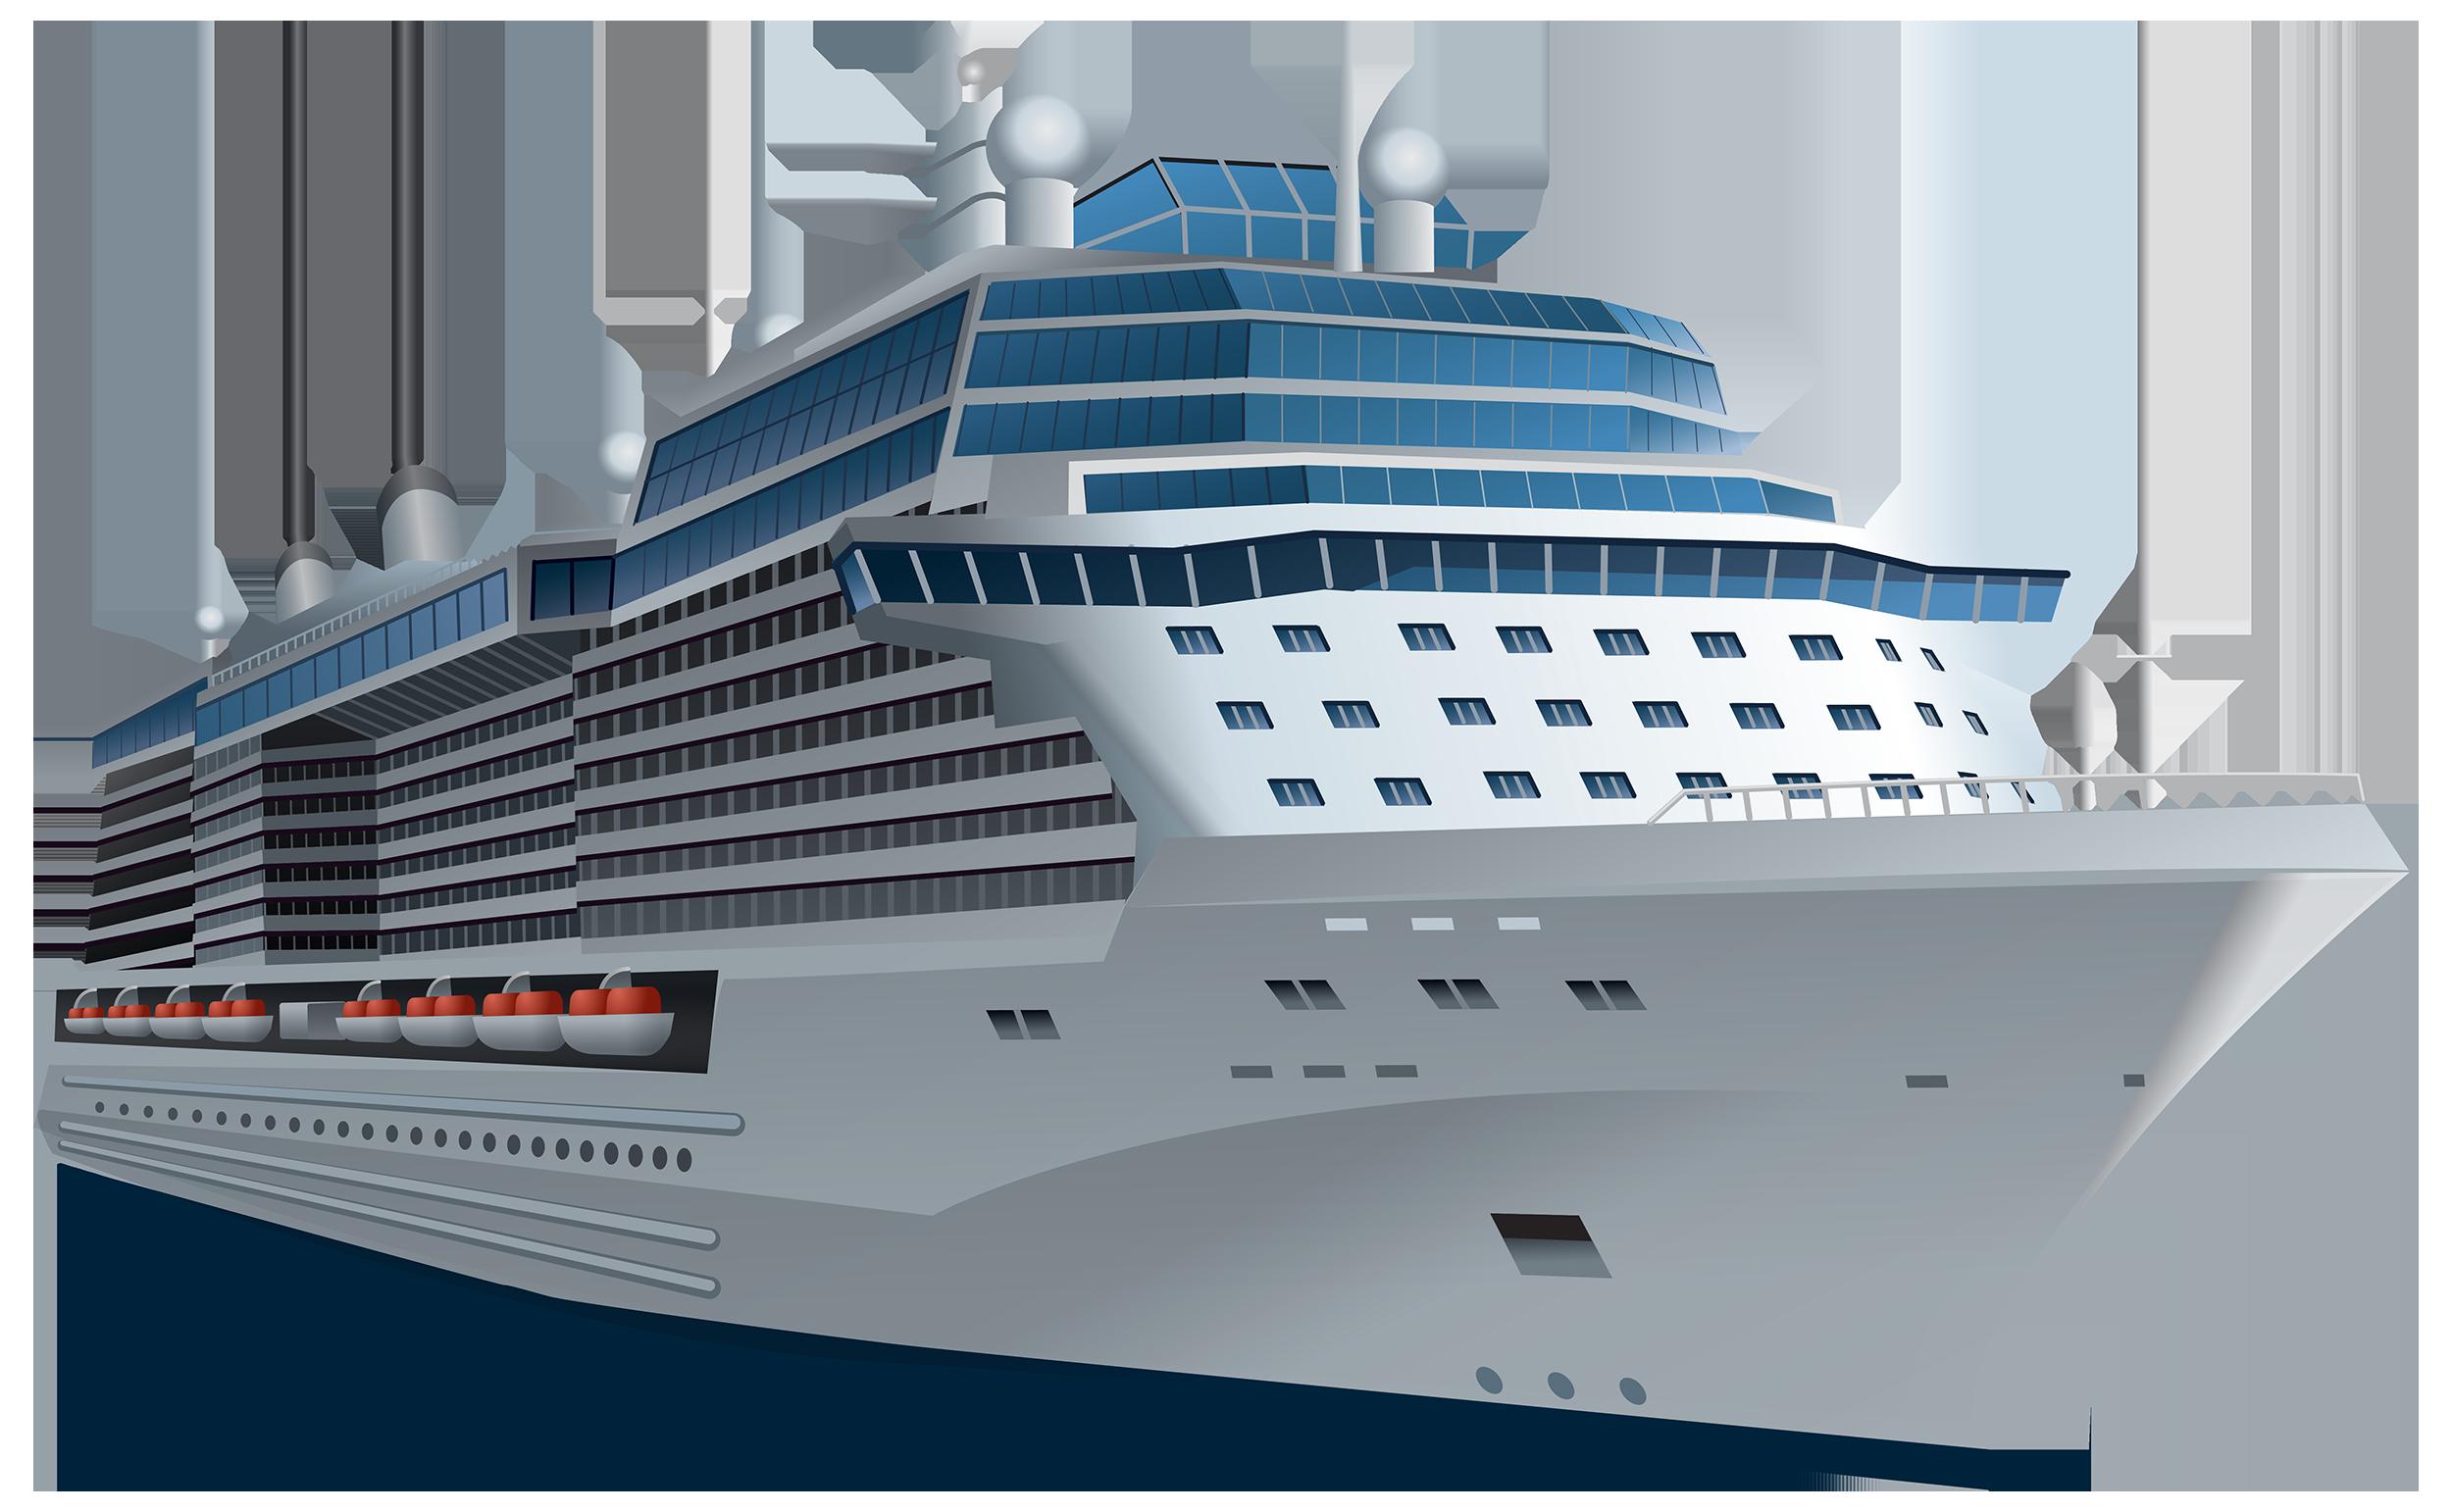 Cruise Ship Png Transparent - Cruise Ship, Transparent background PNG HD thumbnail